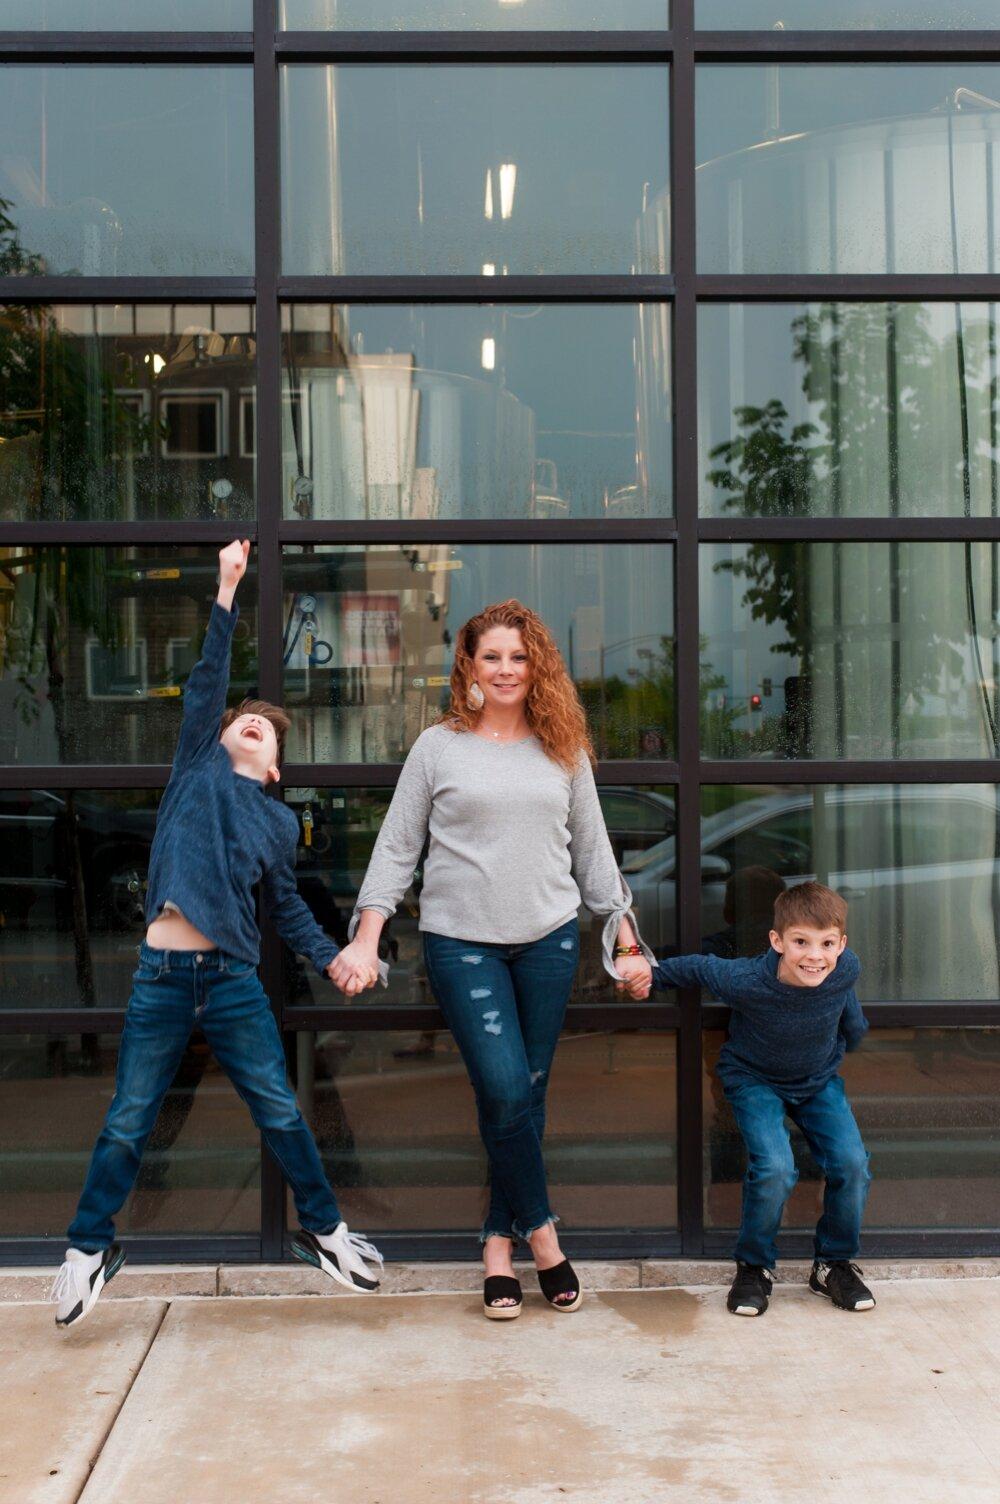 Jodi-Trent-Drake-Family-Session-Indy-Family-Photo_0013.jpg